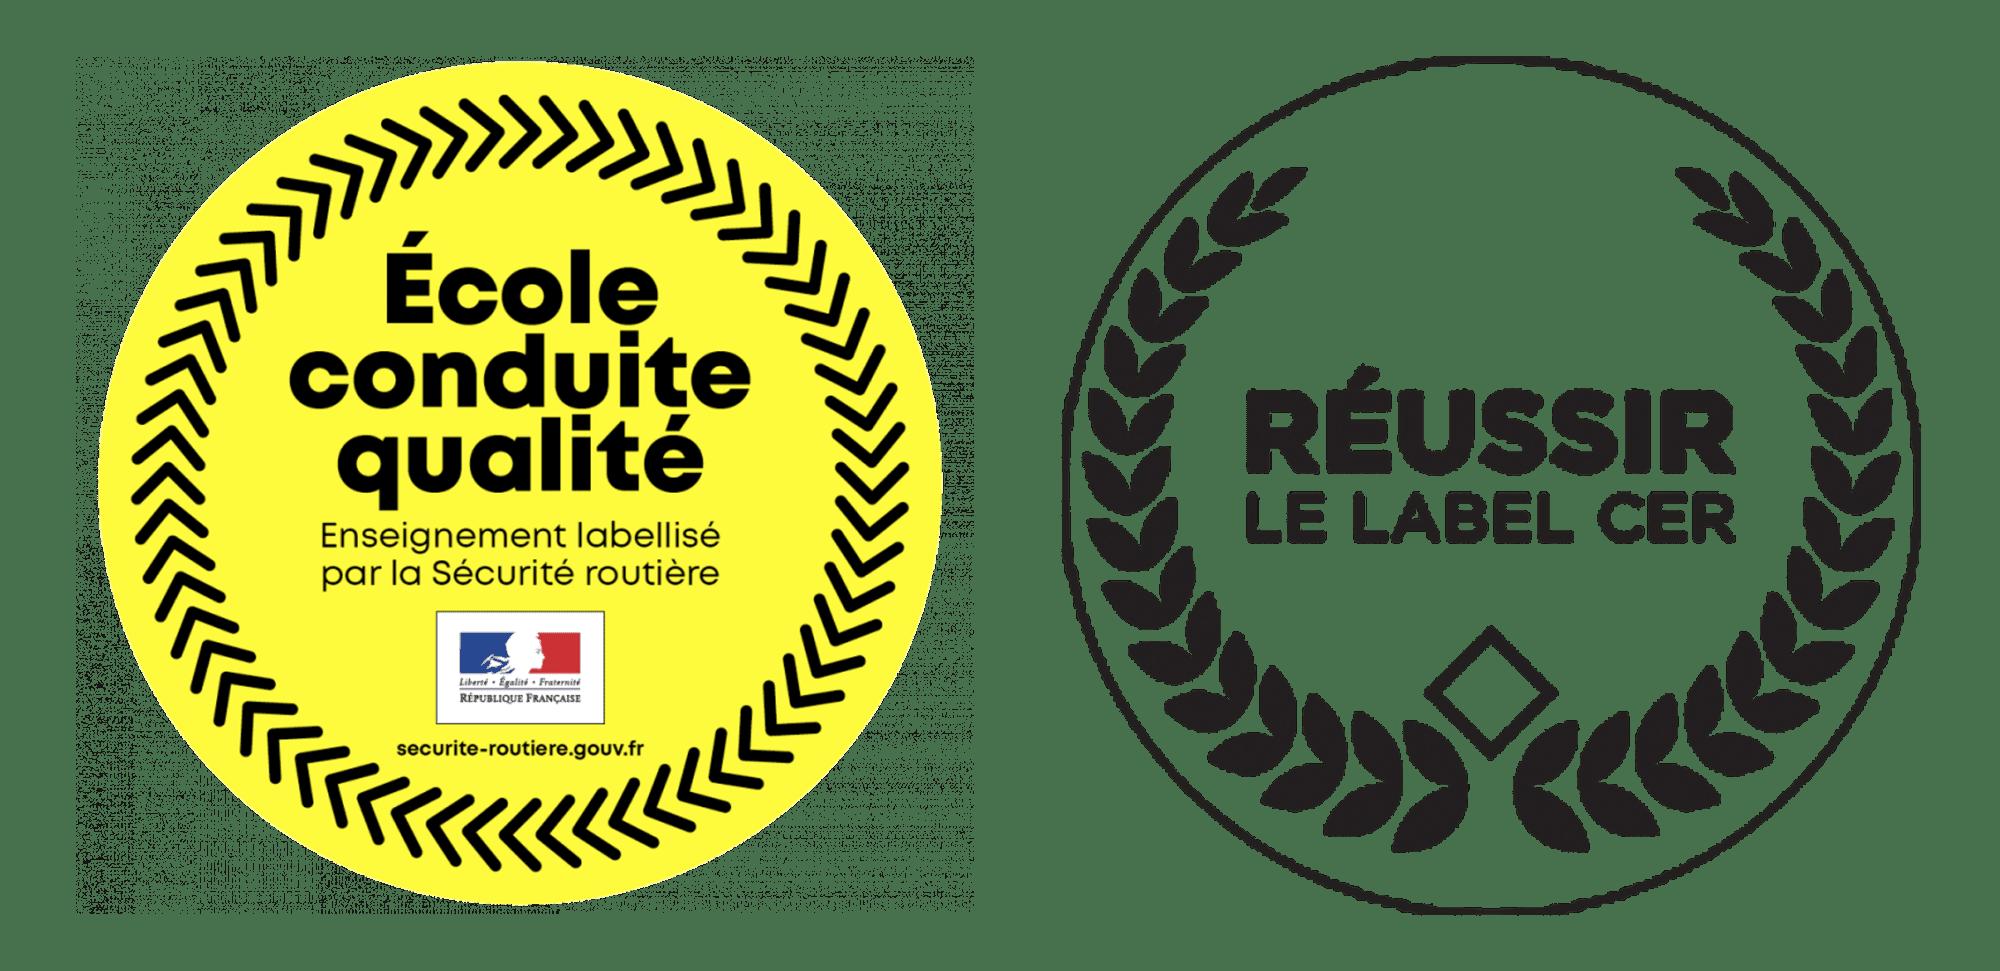 logo label reussir + label etat